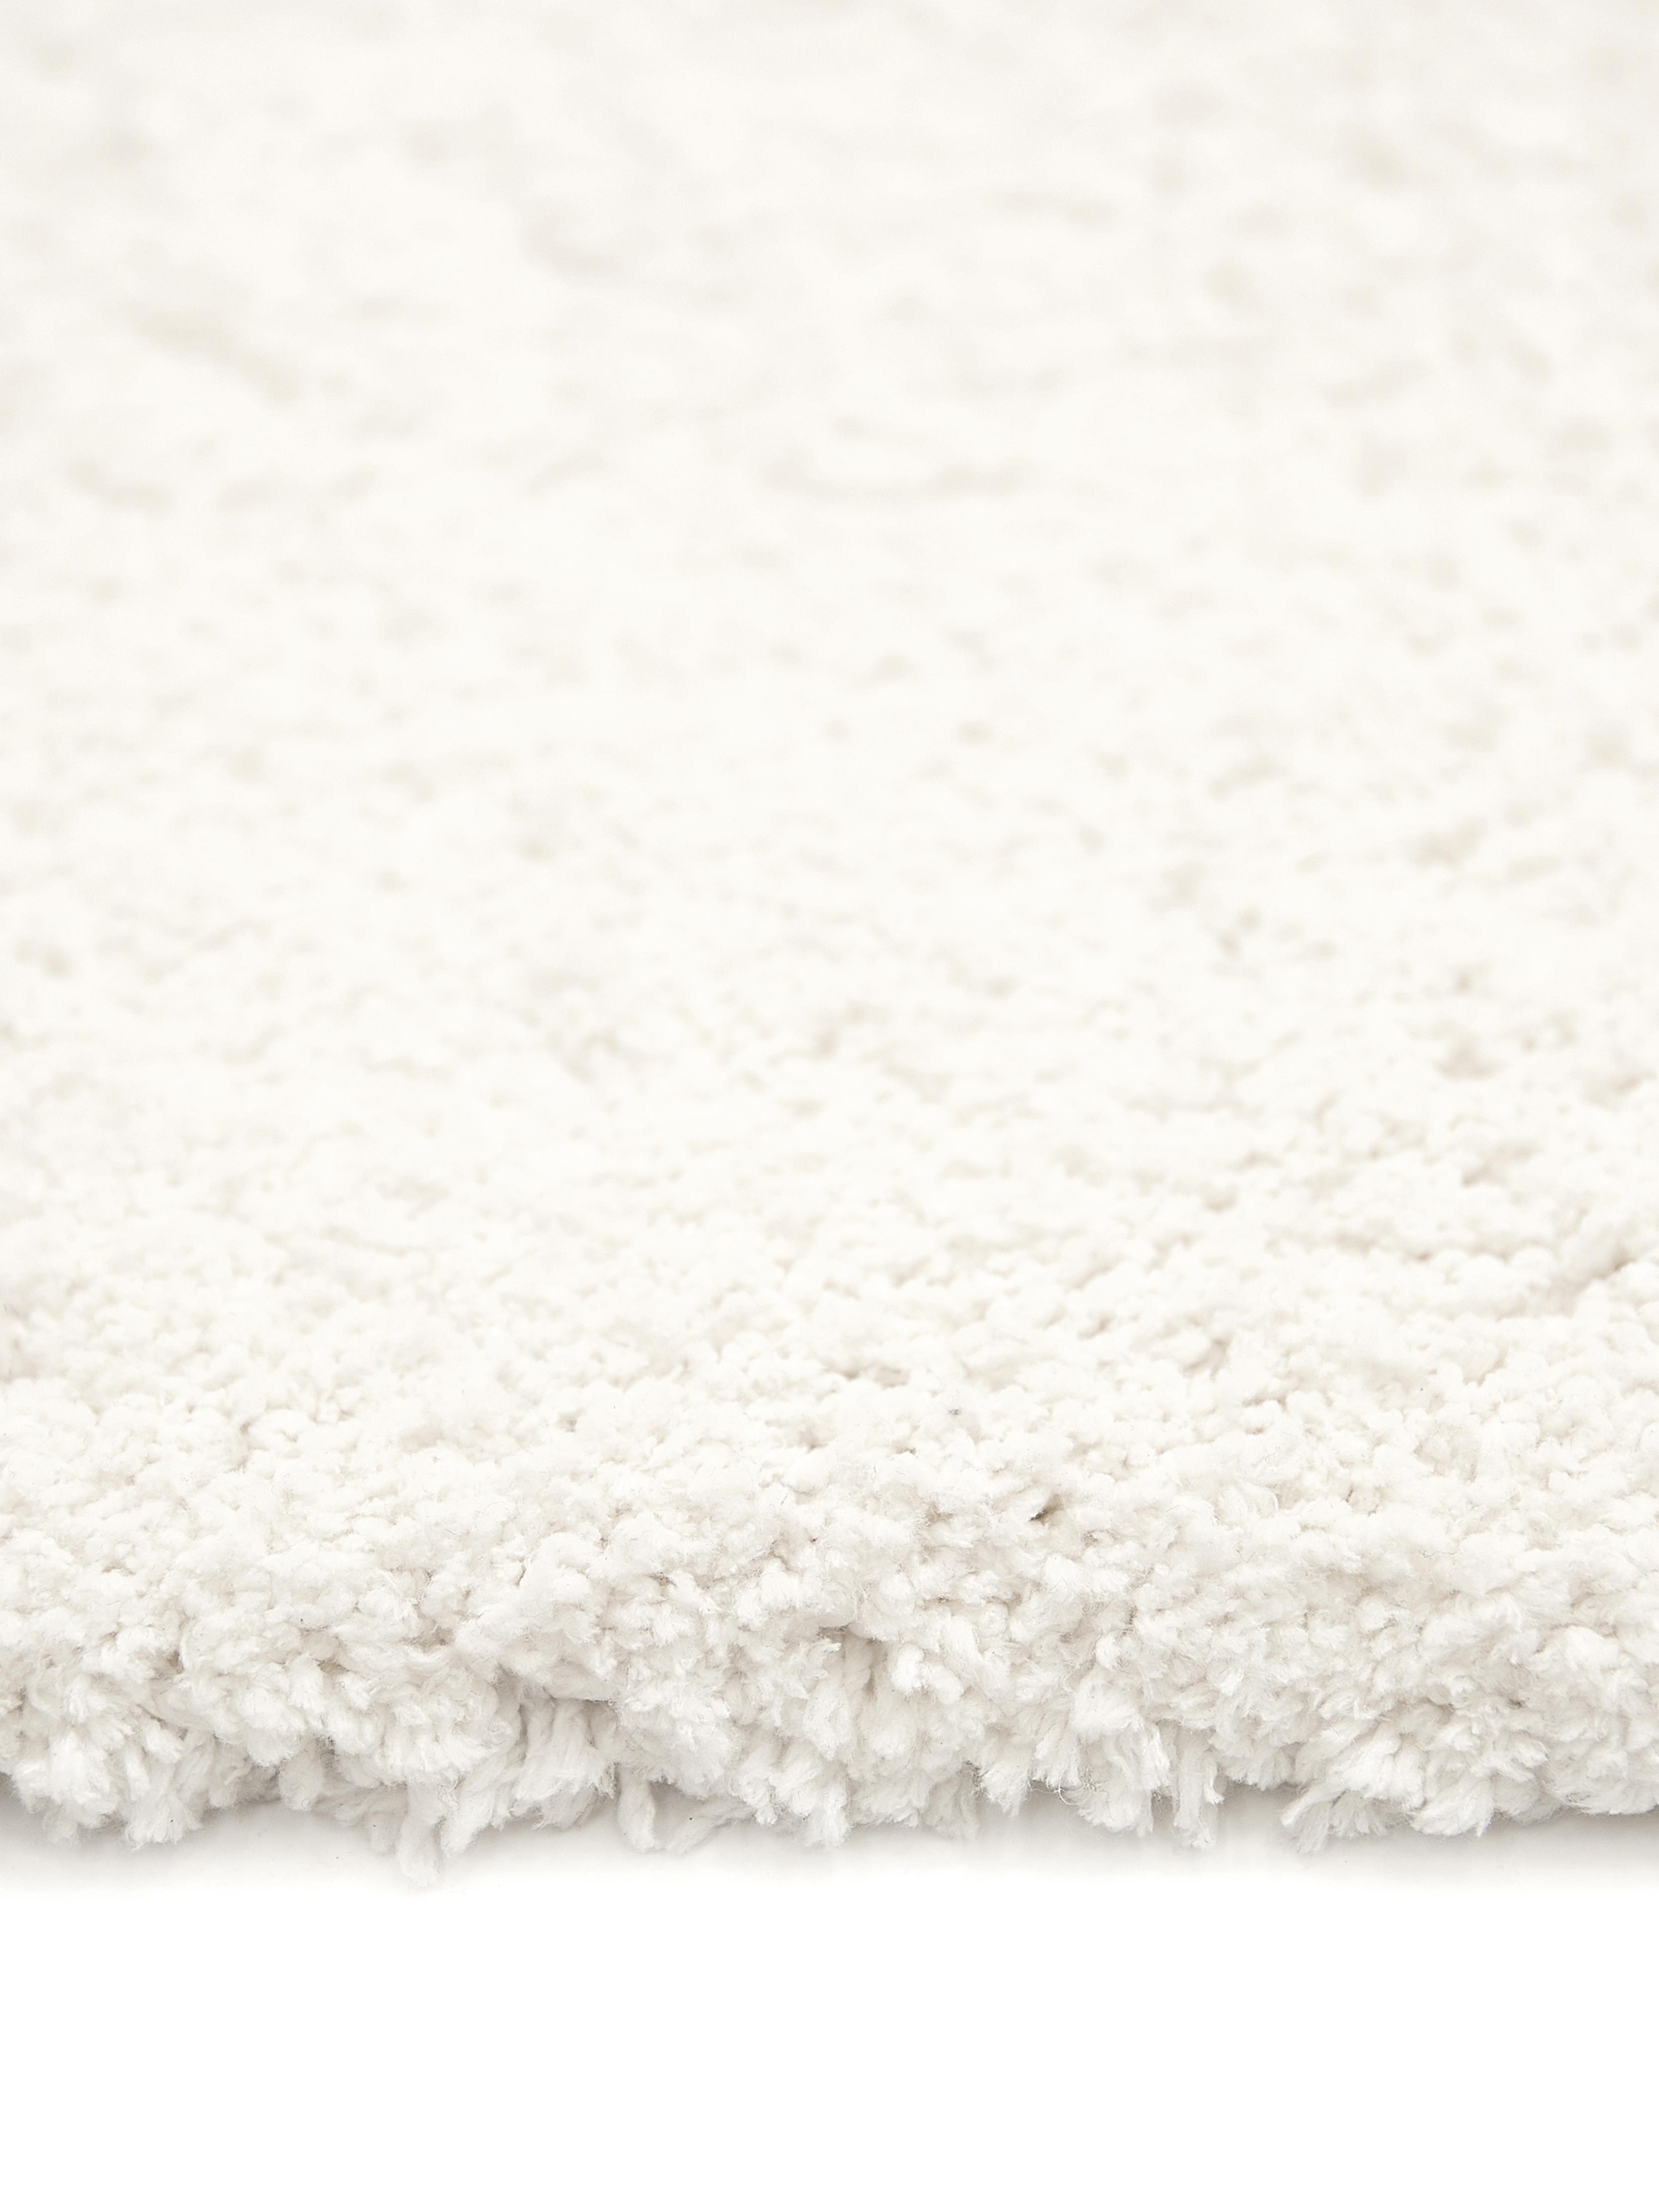 Alfombra mullida de pelo largo Leighton, Parte superior: 100%poliéster (microfibr, Reverso: 70%poliéster, 30%algodó, Crema, An 300 x L 400 cm (Tamaño XL)